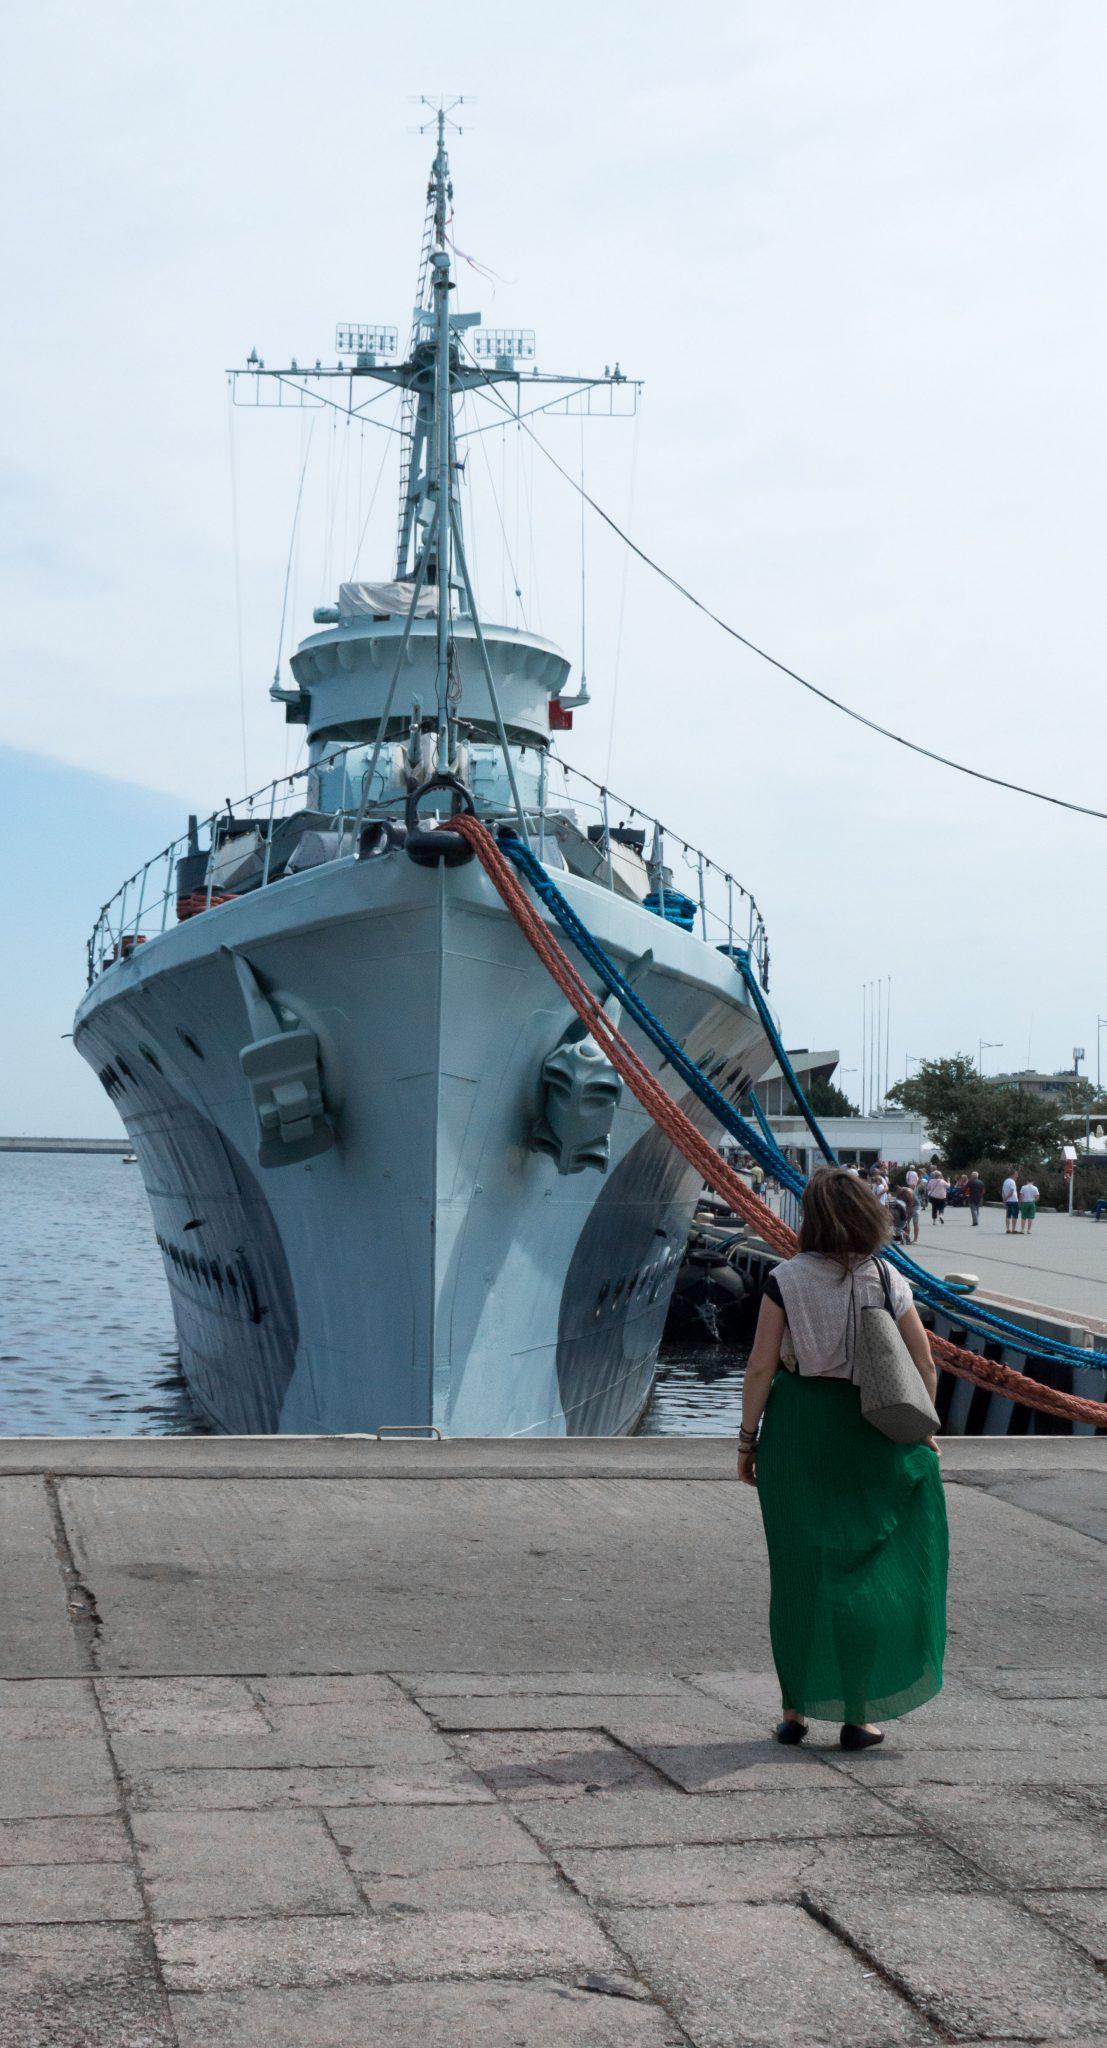 Voglia di partire, Gdynia